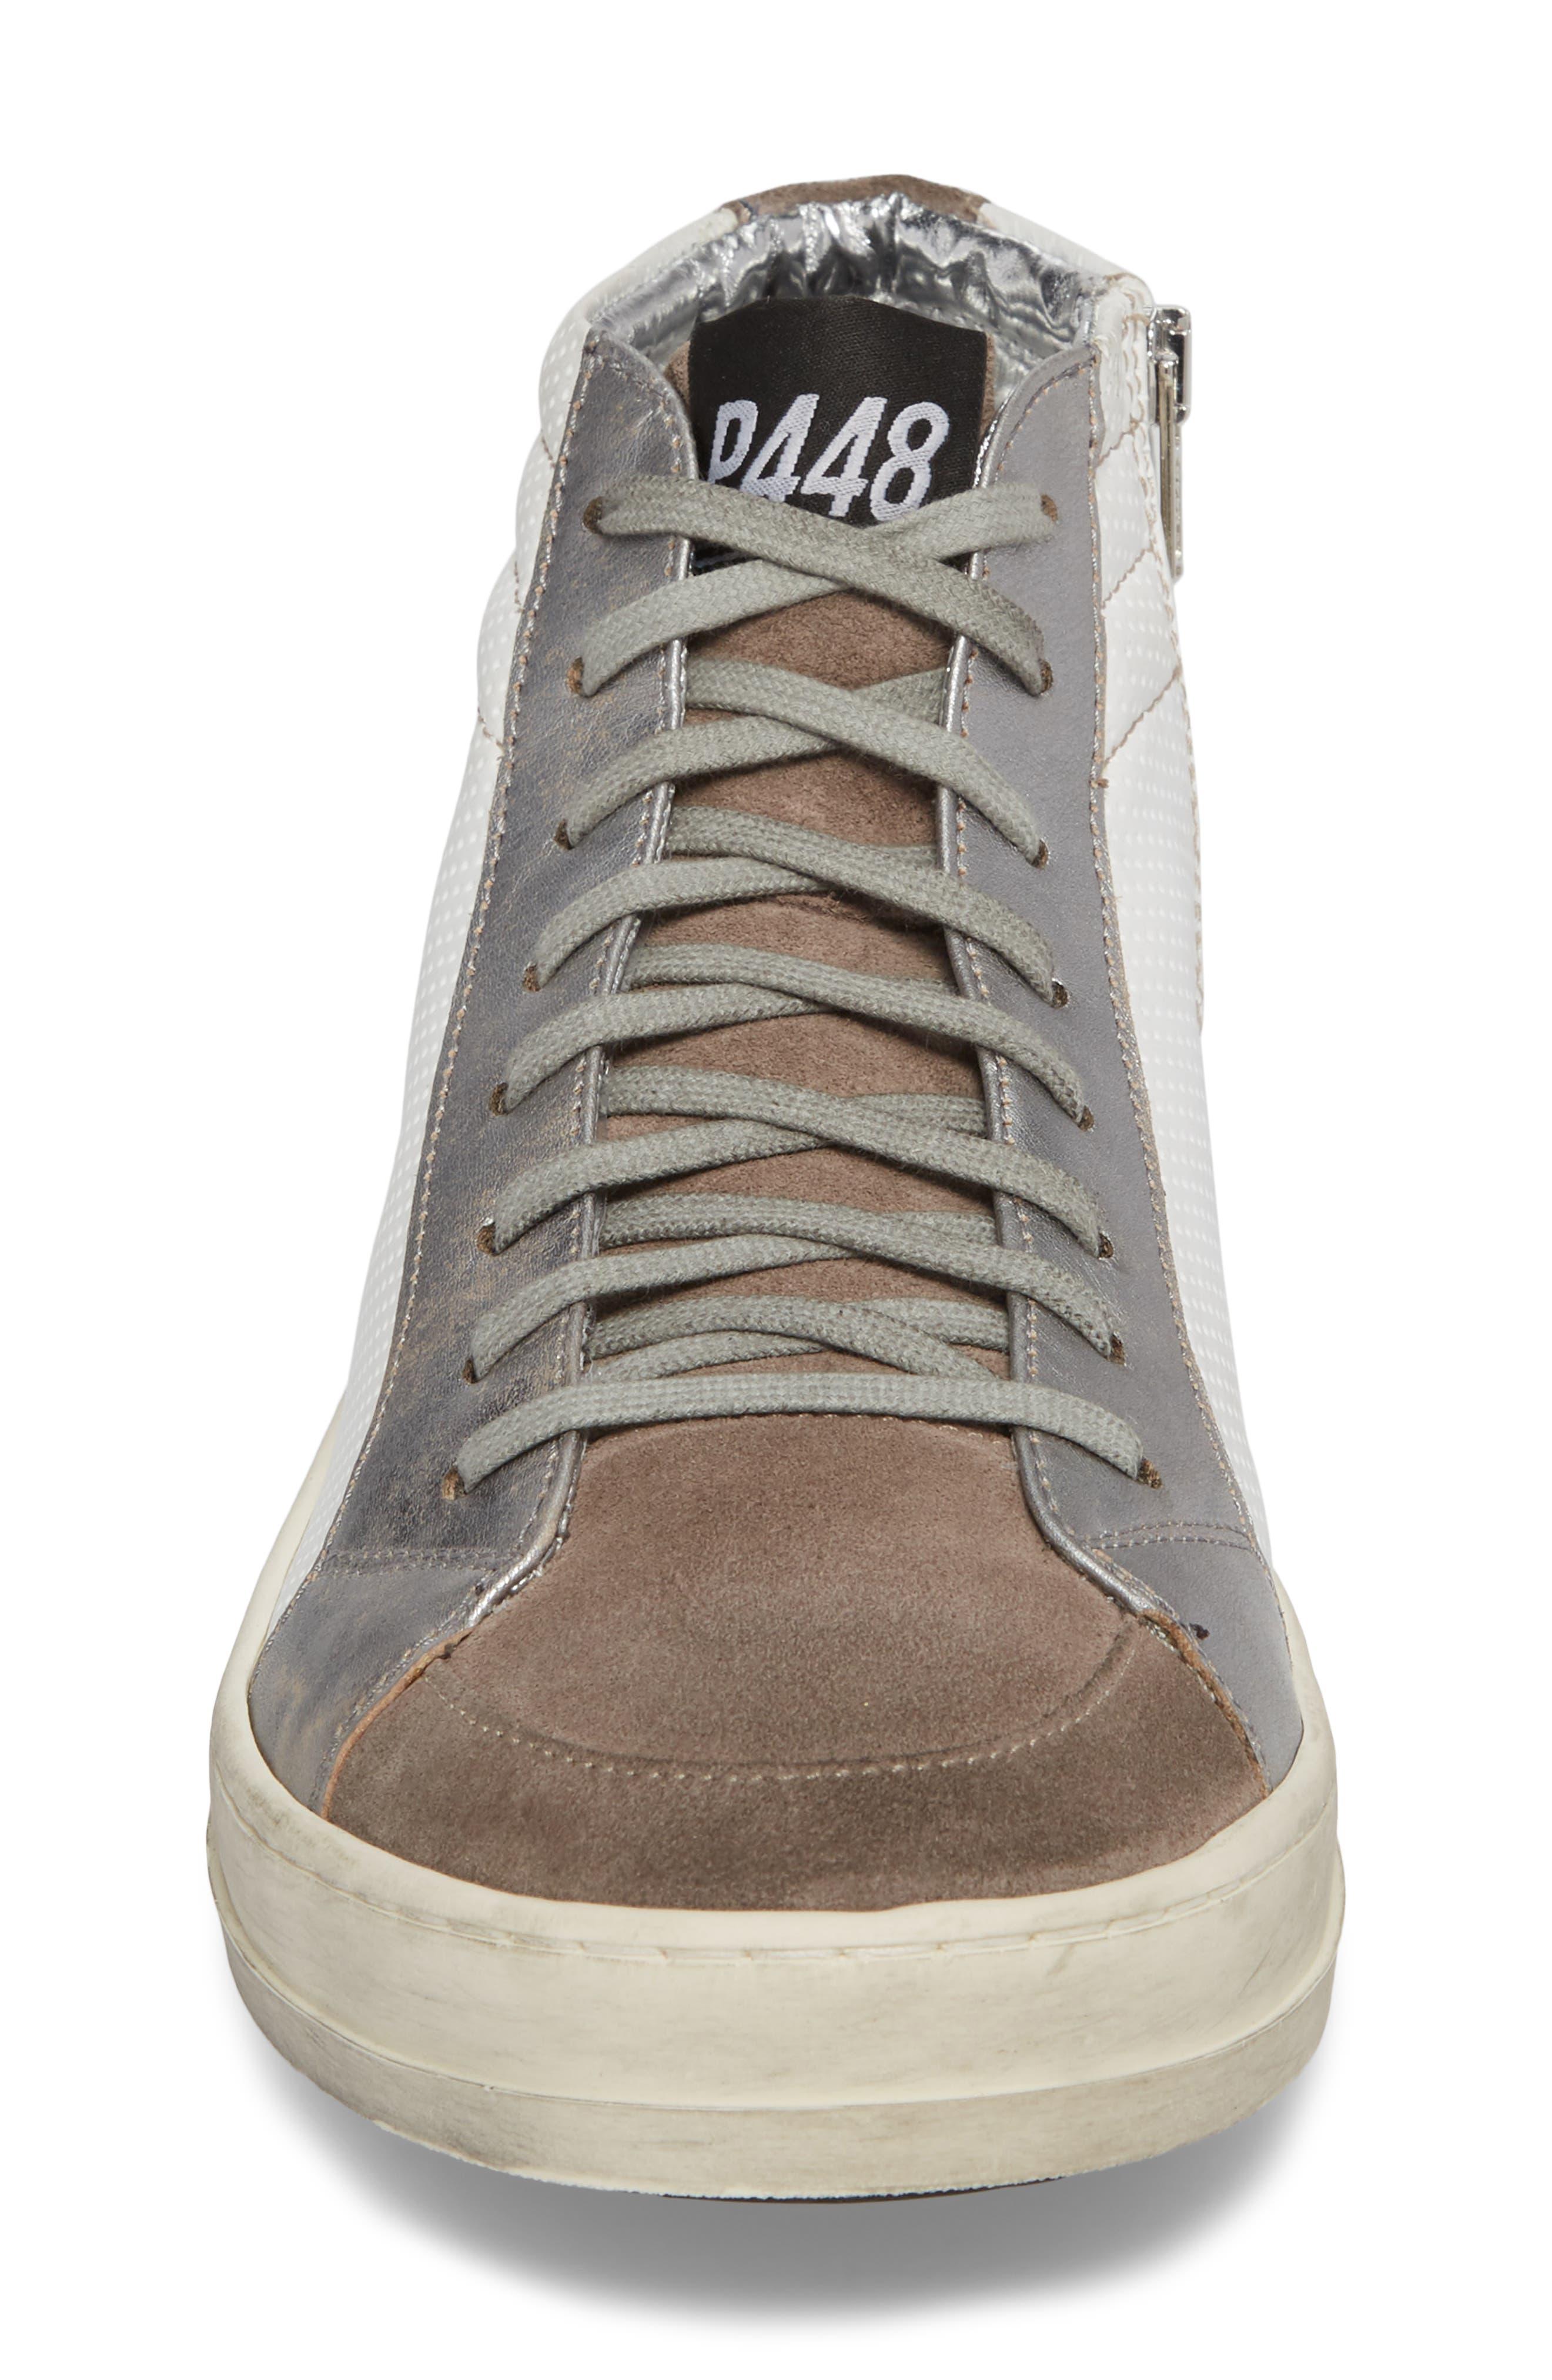 P448,                             Skate High Top Sneaker,                             Alternate thumbnail 4, color,                             111